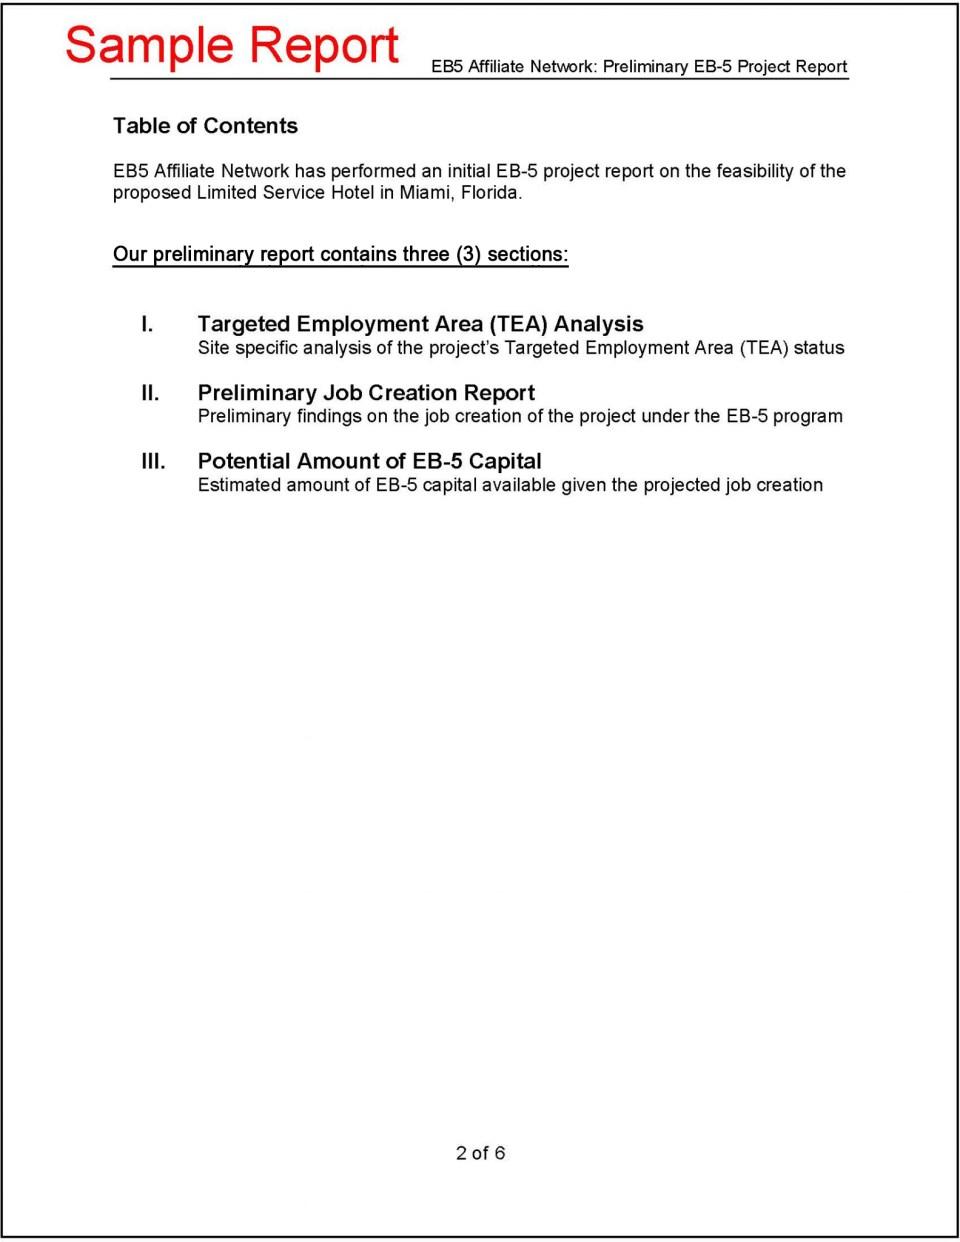 Sample Preliminary Job Report (V7) Final (BLACK) 3.23.2016 RED BORDER_Page_2